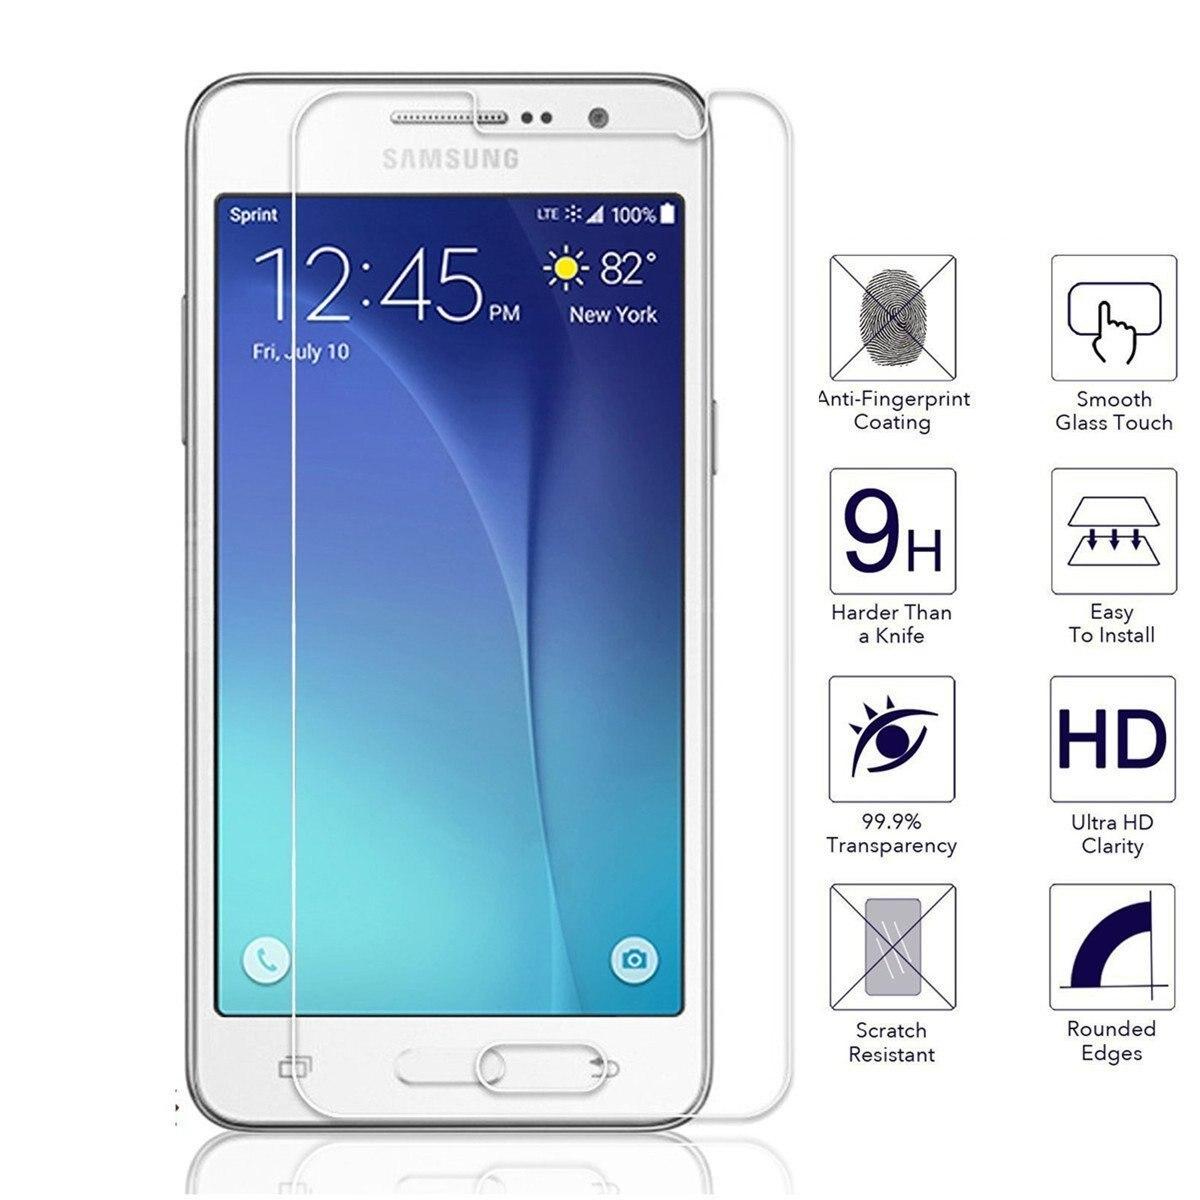 Vidrio templado de protector de pantalla Premium para Samsung Galaxy J1 J3 J5 J7 2016 A5 S3 S4 S5 NEO S6 Grand Prime G531 película protectora